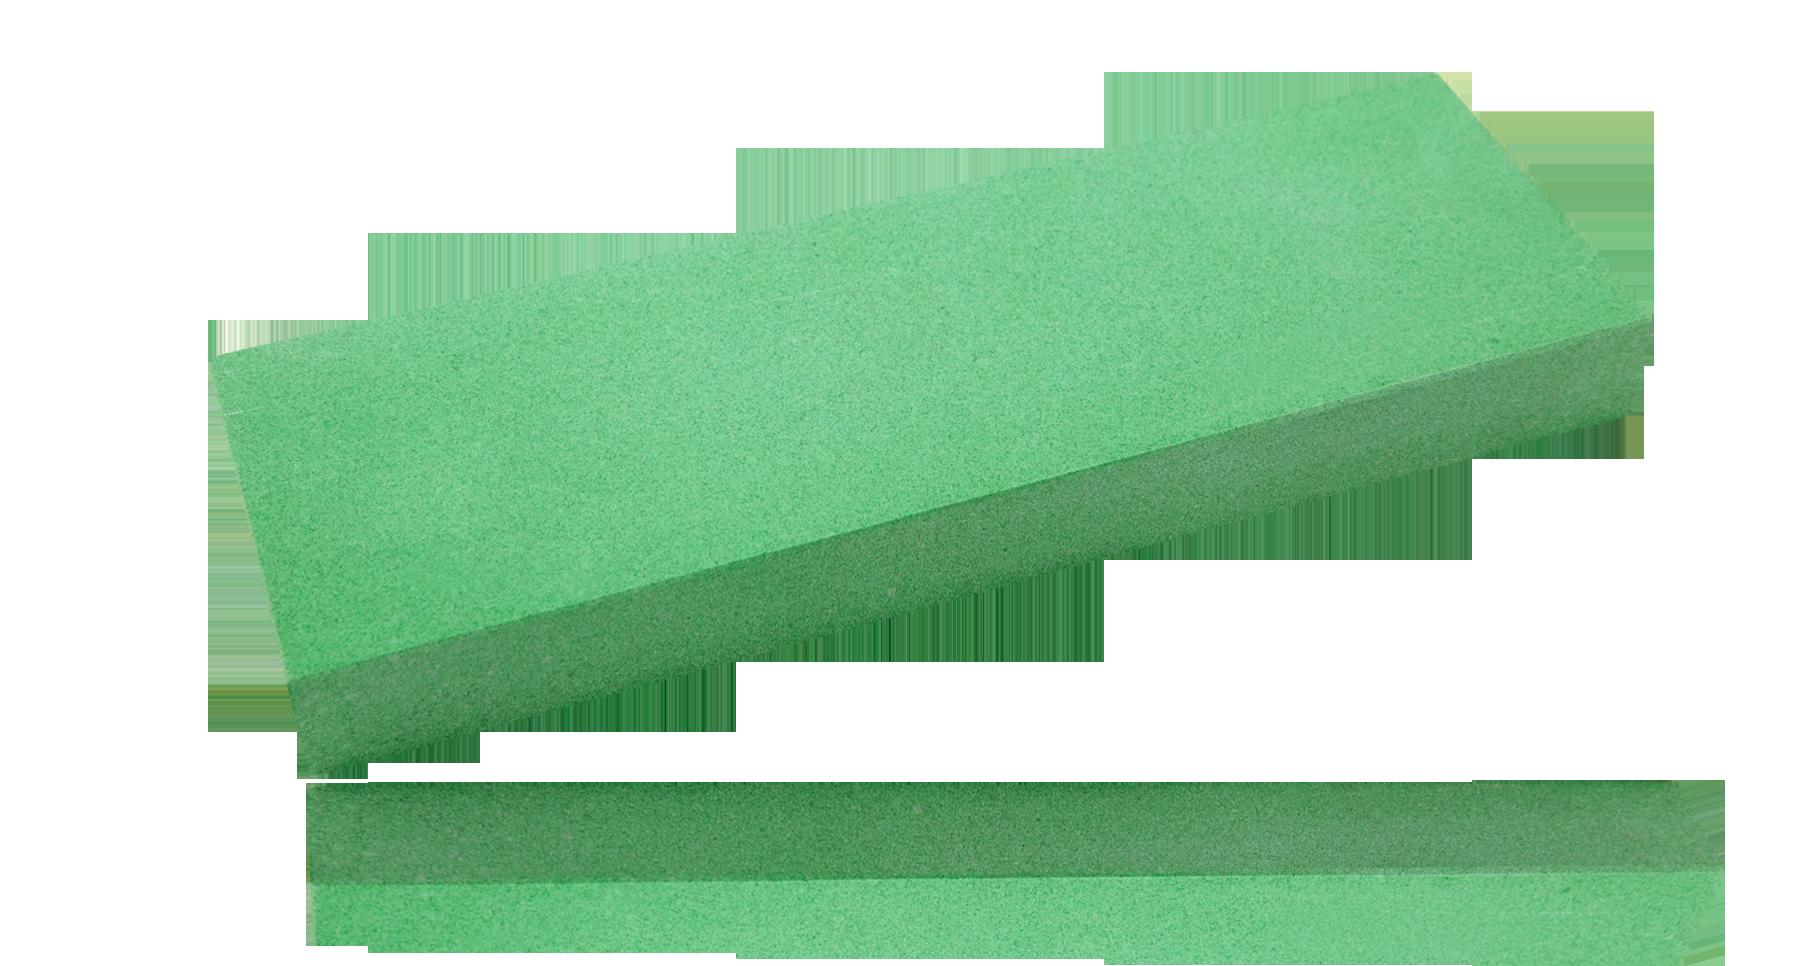 Камень точильный Naniwa S-404.